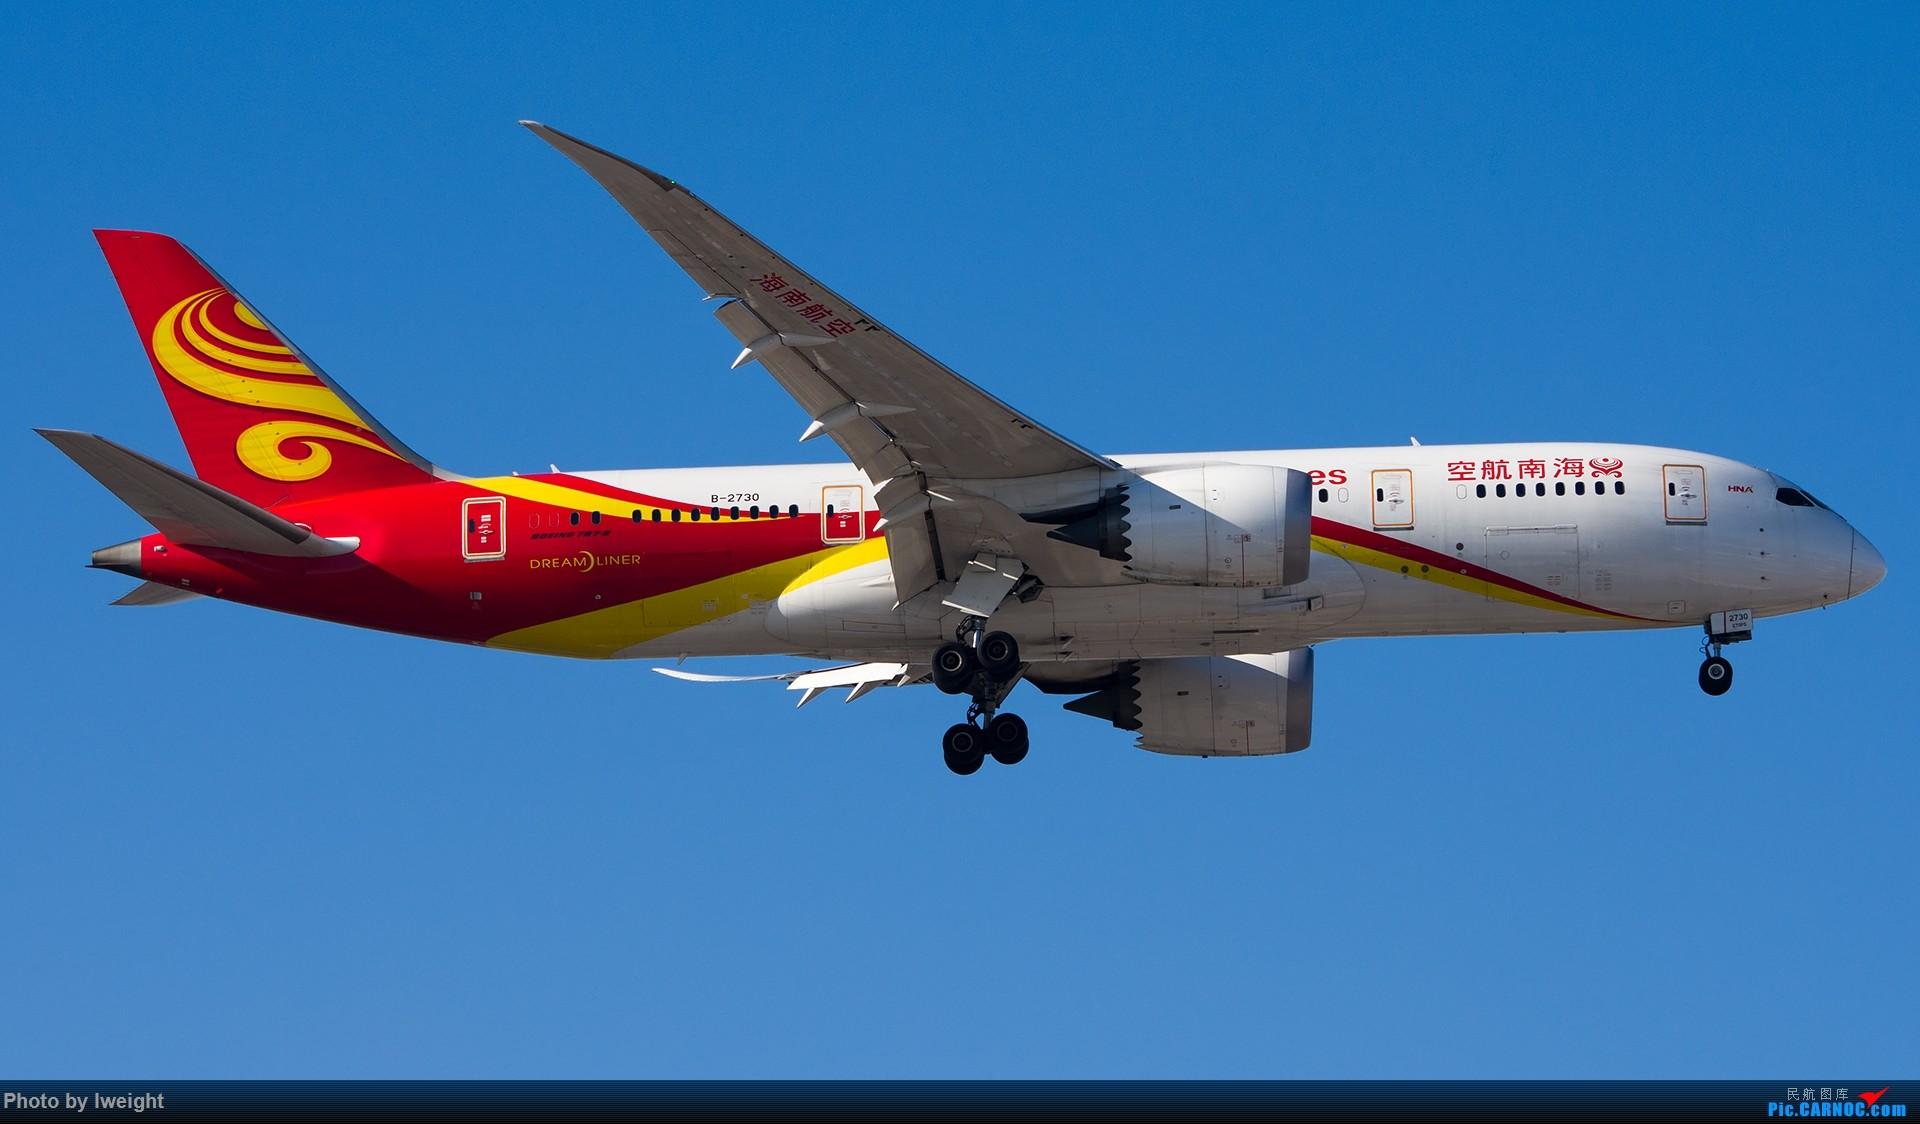 Re:[原创]终于在12月的北京等到了一个晴天的周末,出来拍拍飞机【2015-12-5】 BOEING 787-8 B-2730 中国北京首都国际机场